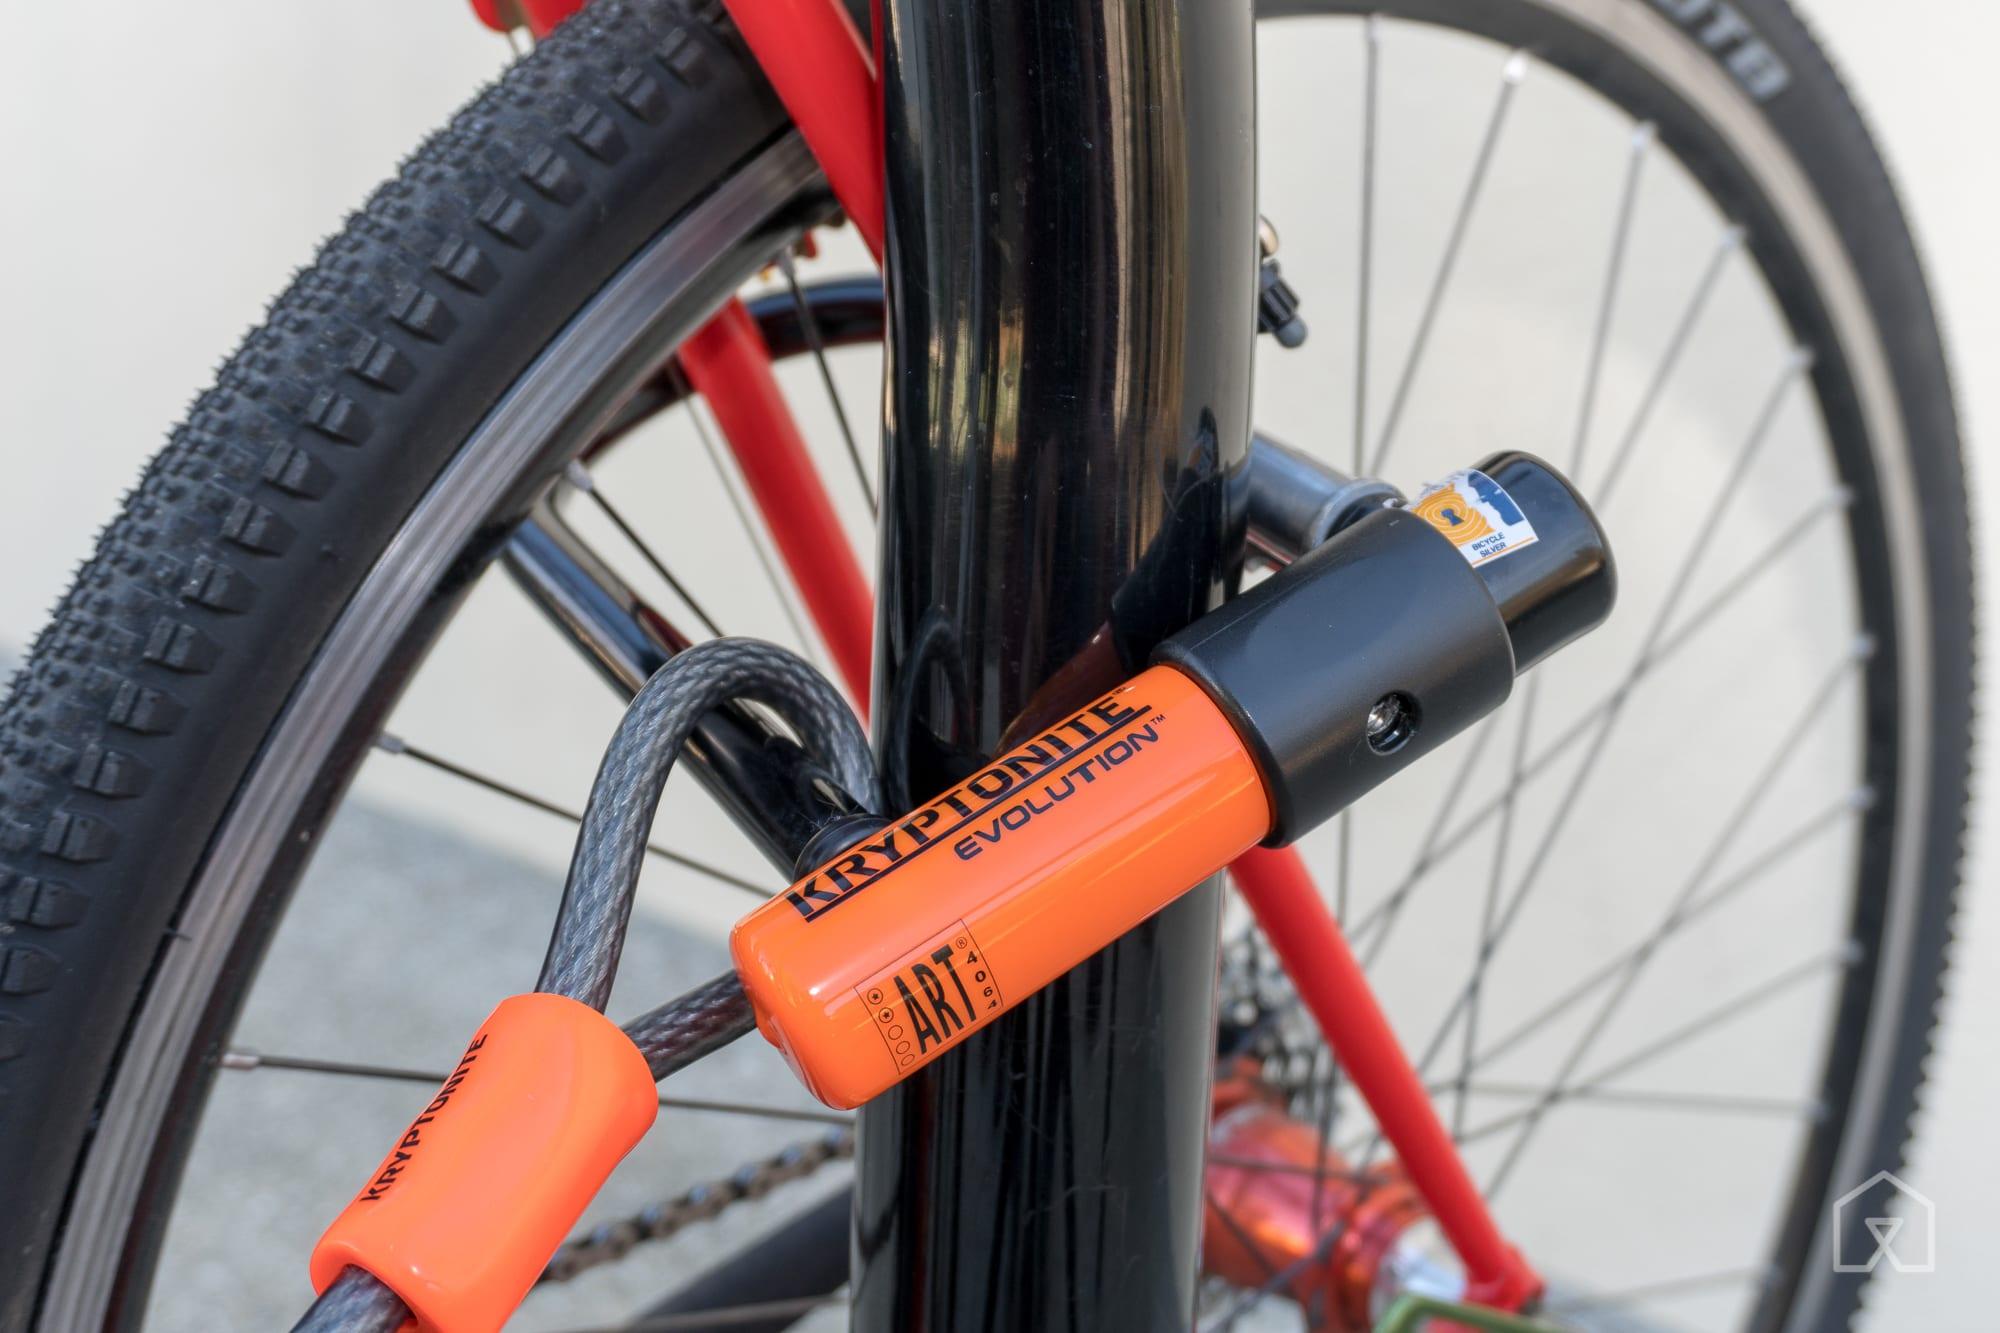 Best Bike Lock 2020 The best bike lock